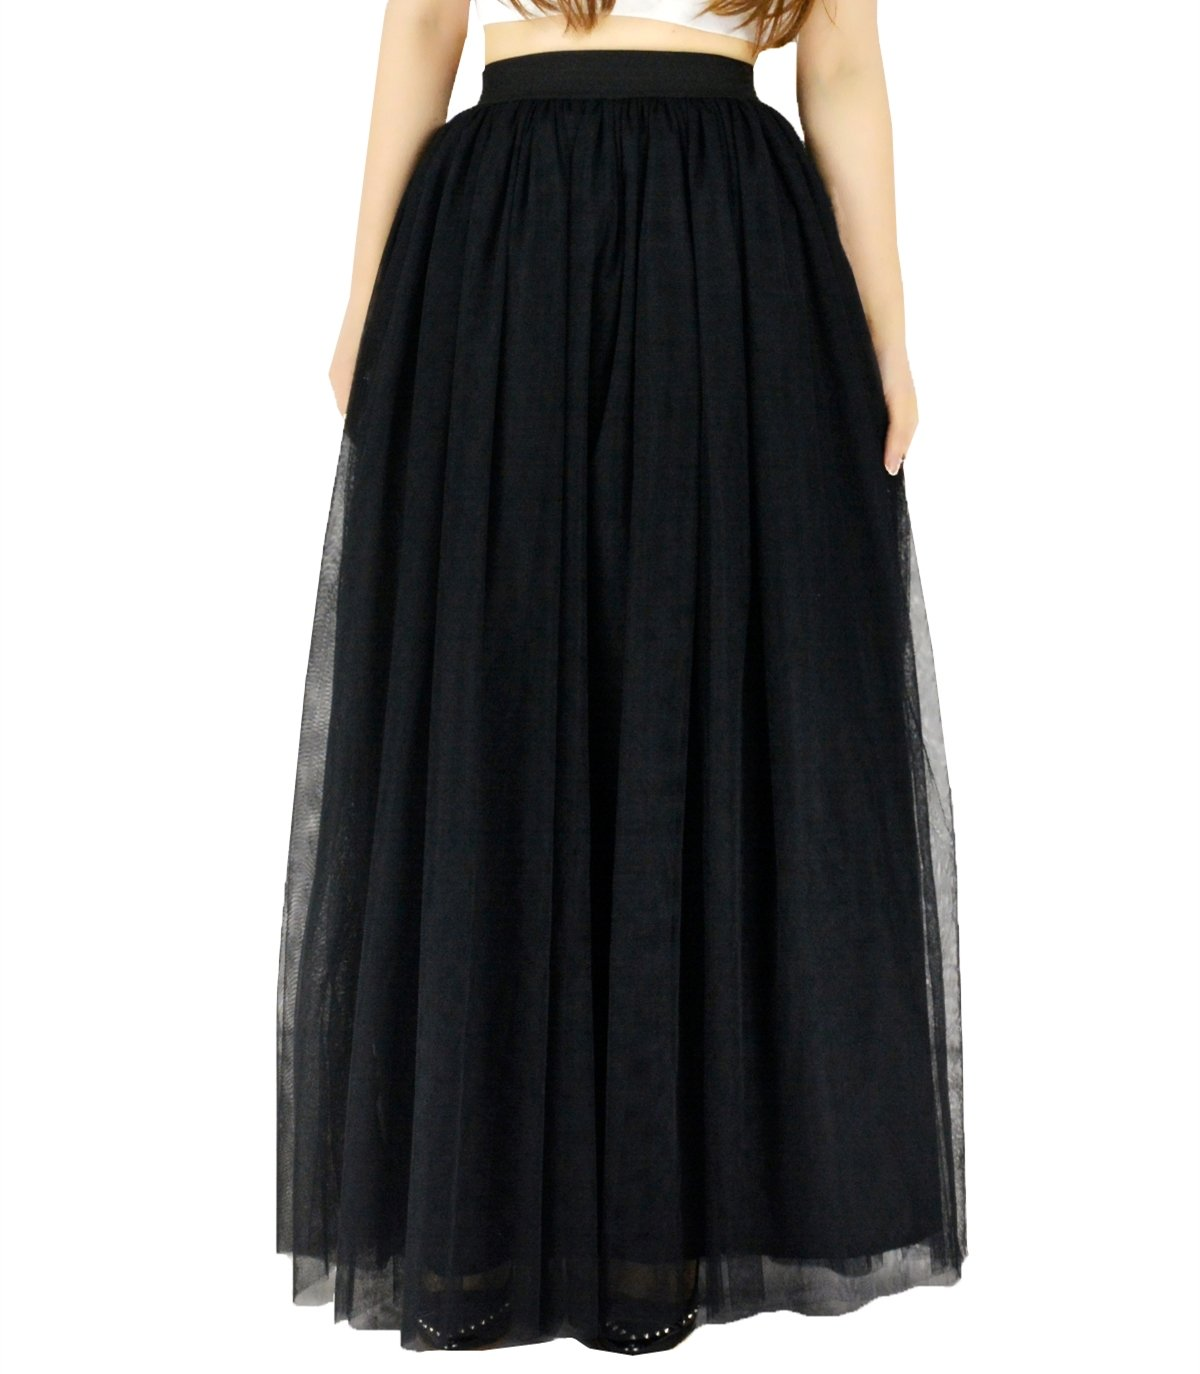 YSJ Women's 39.3 Long Bridal Wedding Petticoats Rockabilly Tutu Skirt Underskirt 017